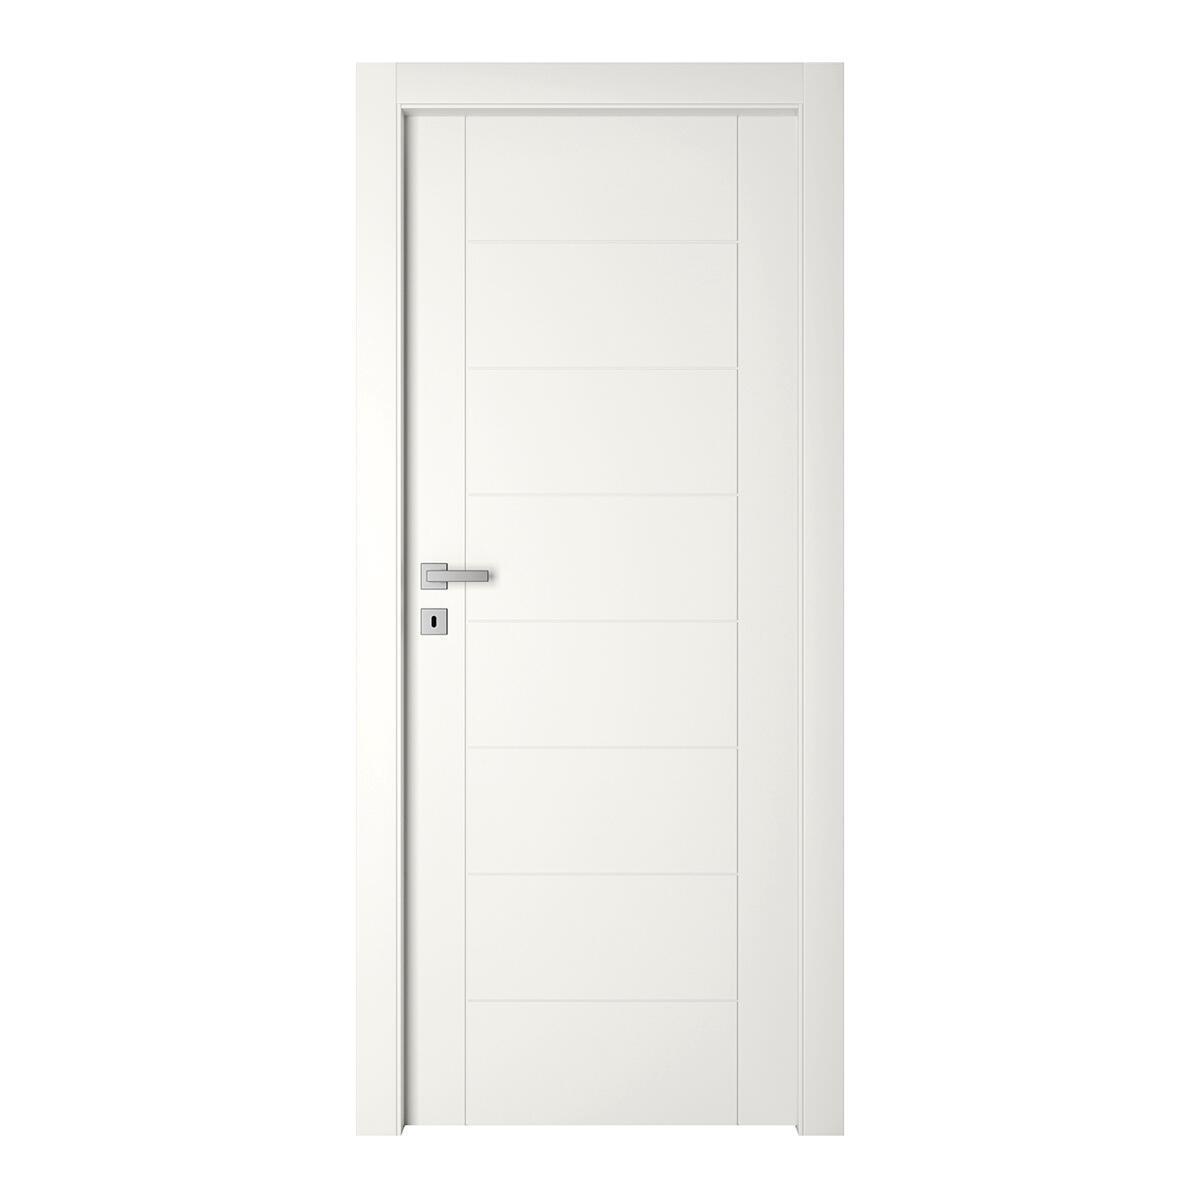 Porta a battente Chamberi bianco L 60 x H 210 cm reversibile - 7